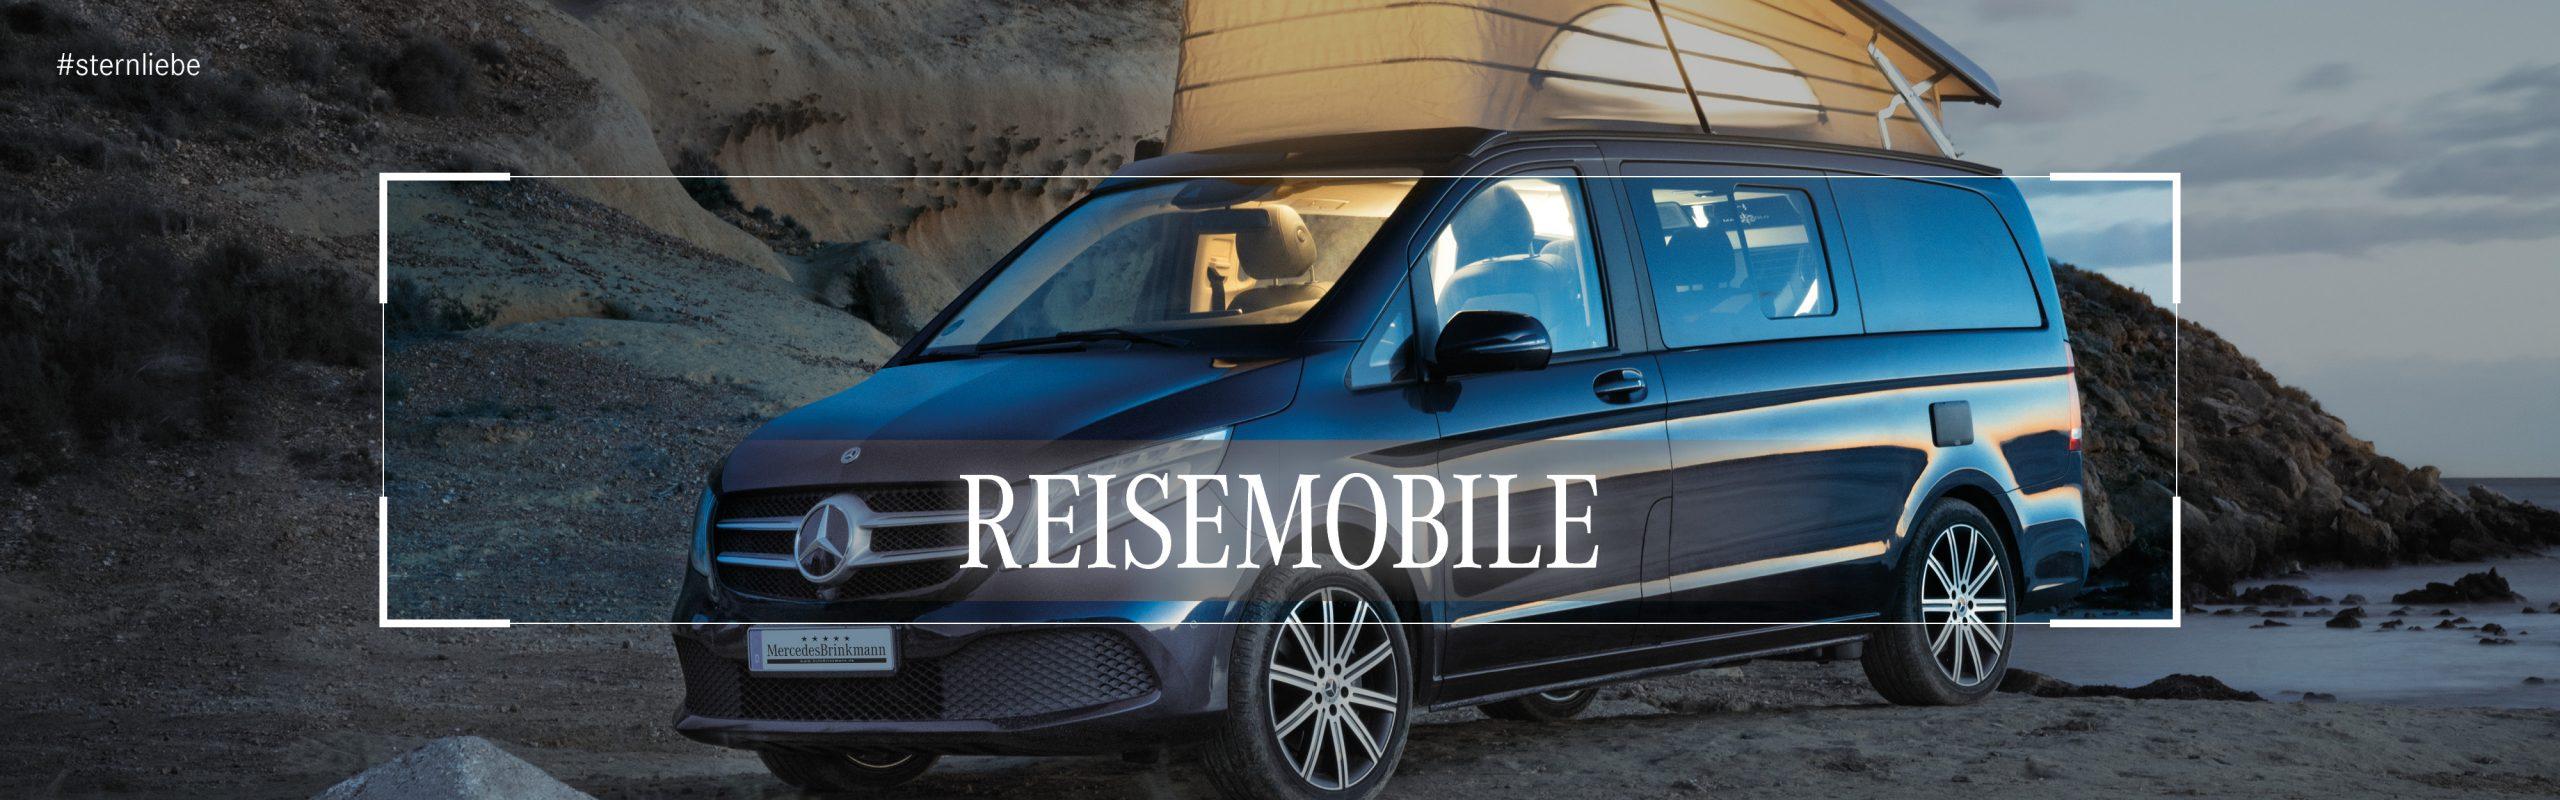 Banner-Reisemobile_Vklasse-marco-polo bei mercedes brinkmann das autohaus